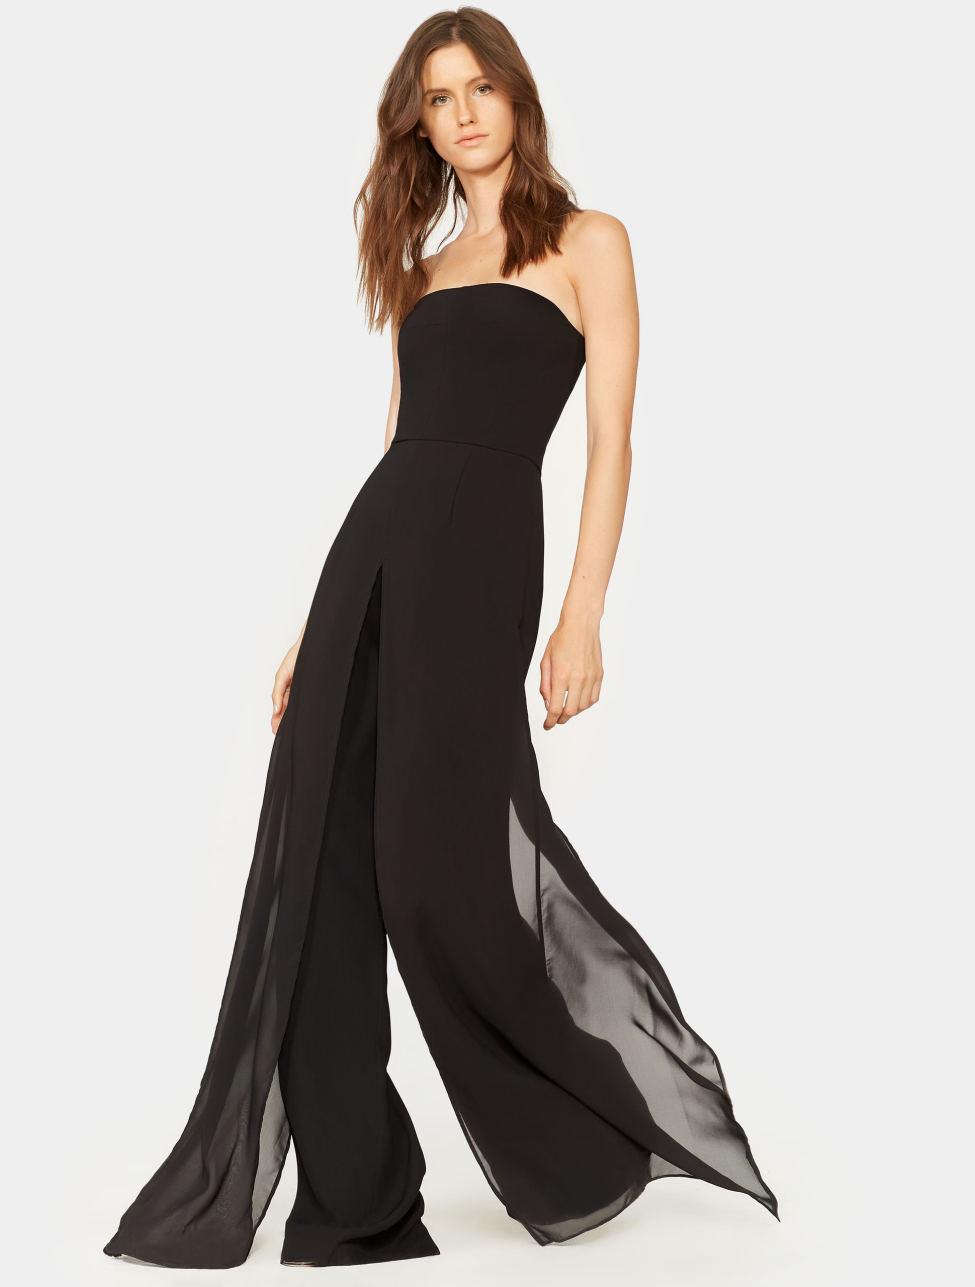 d24741242983 Halston Chiffon Overlay Strapless Jumpsuit in Black - Lyst